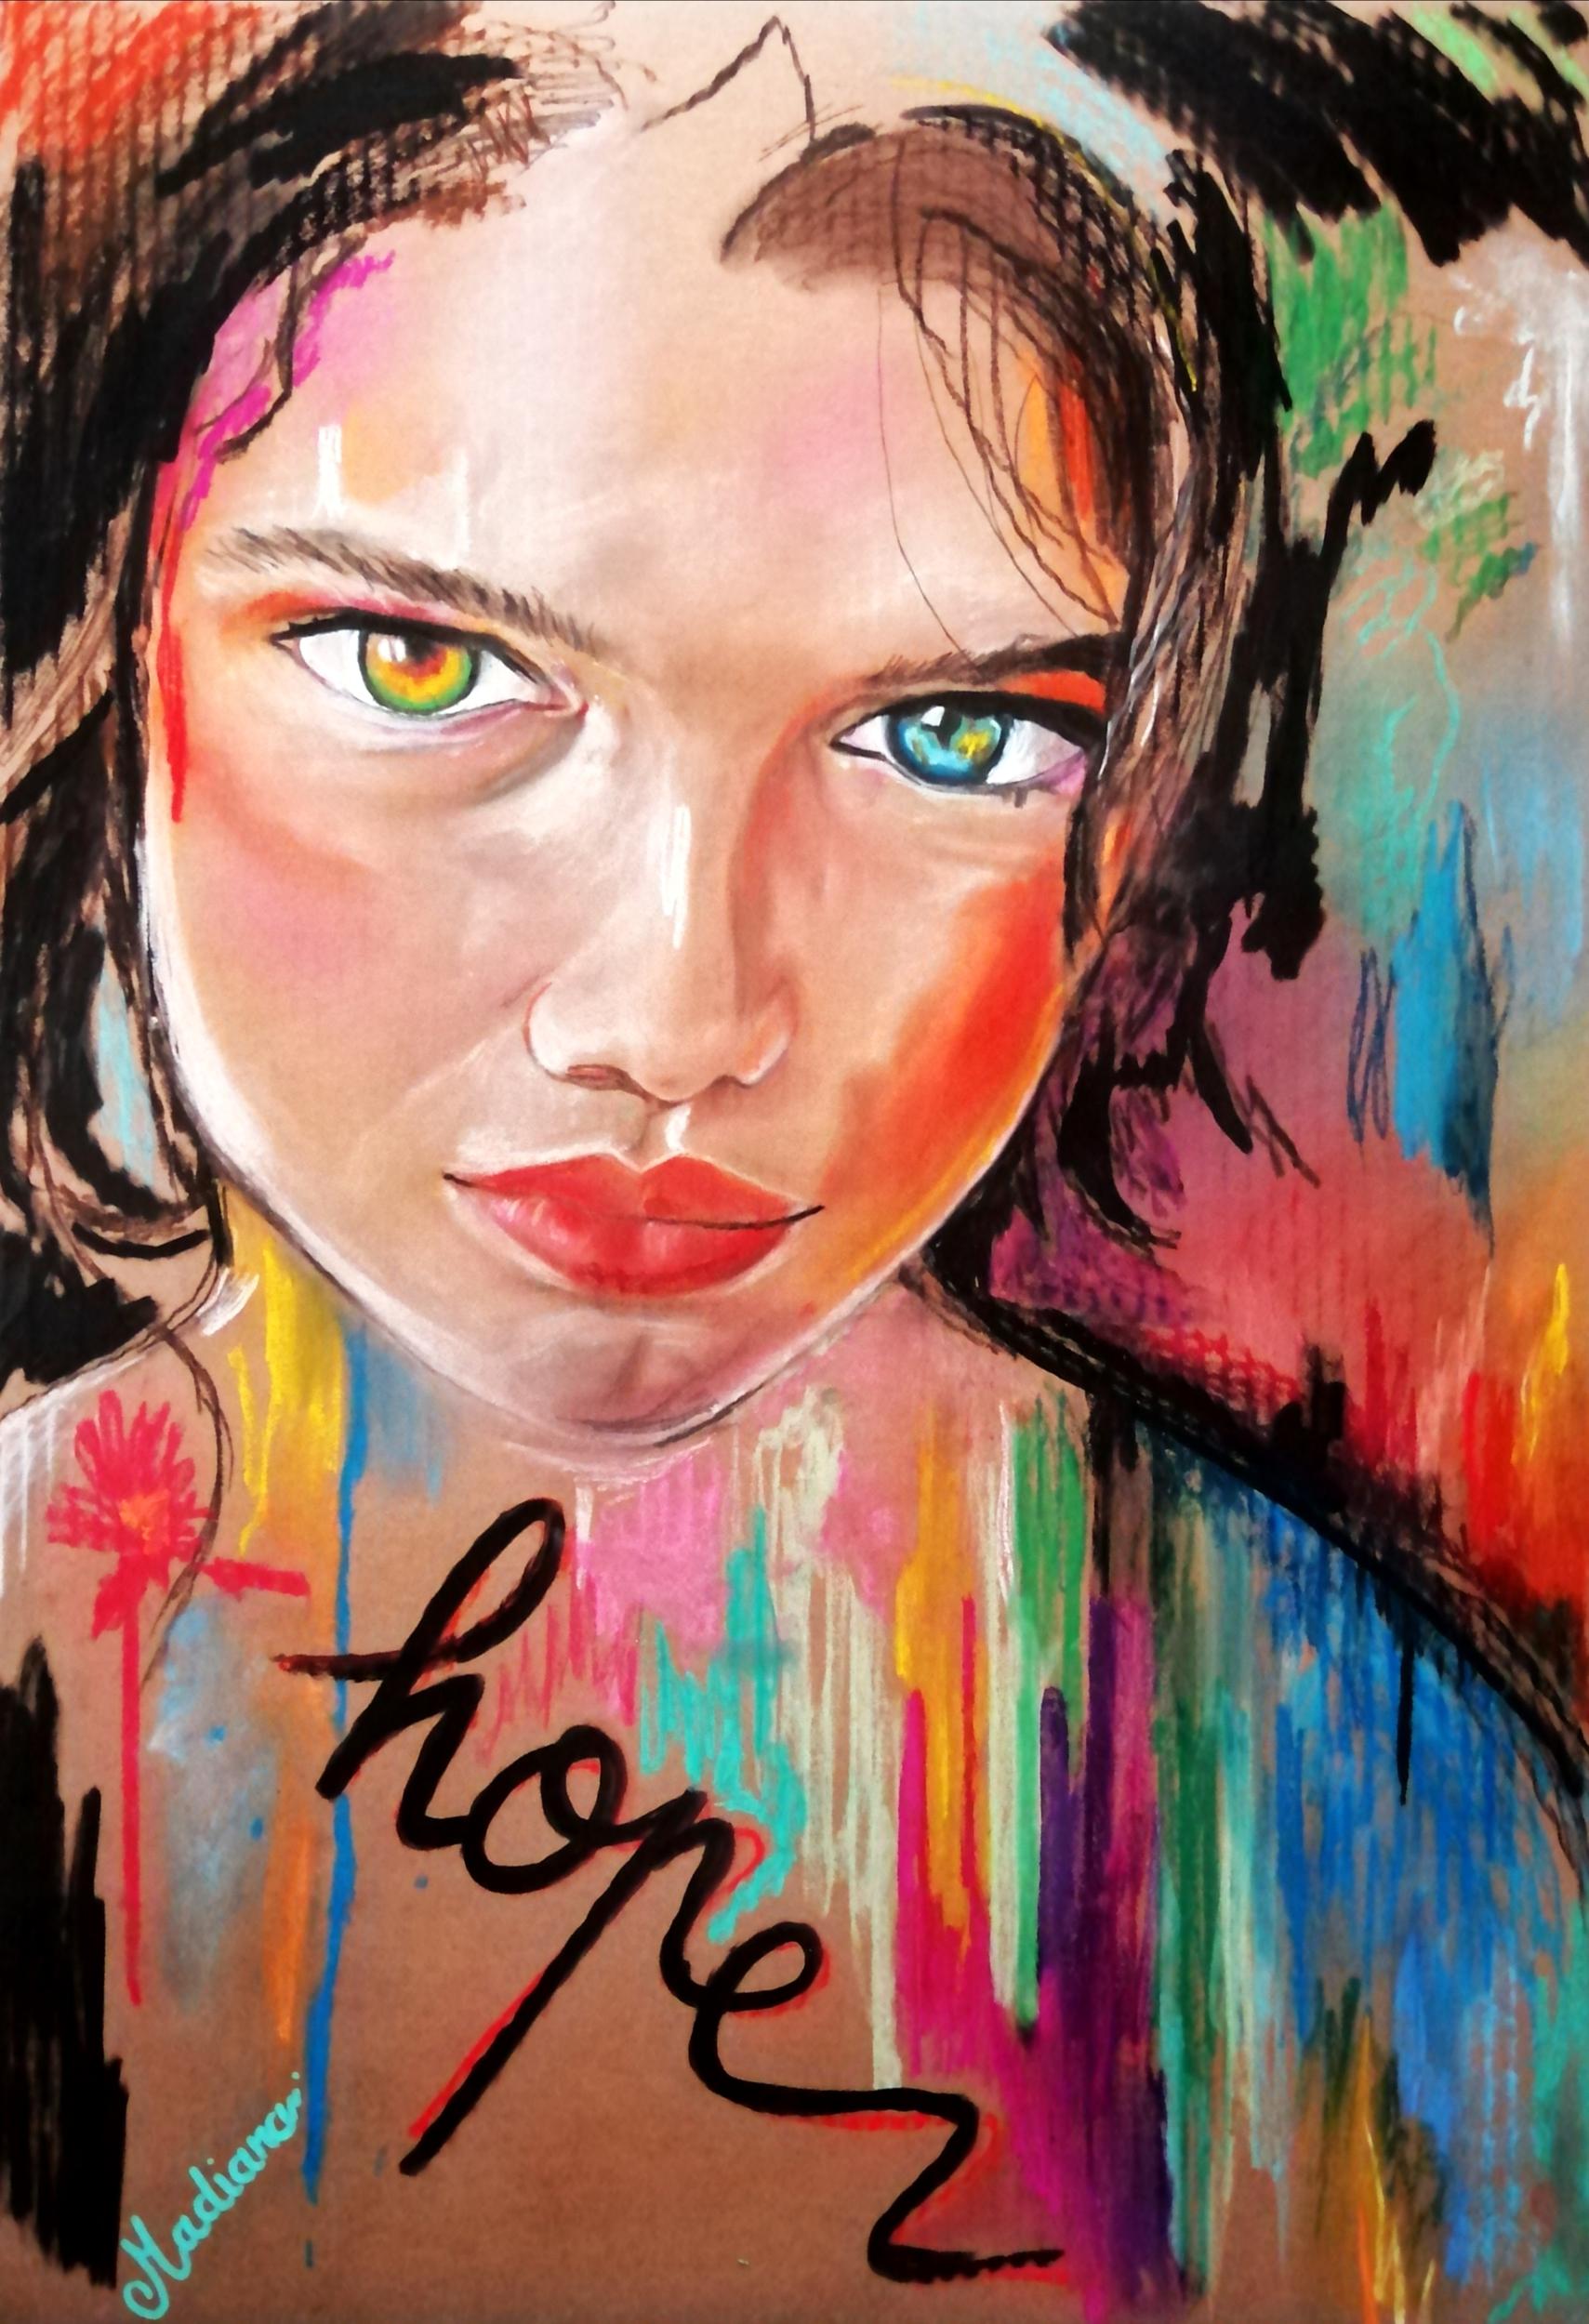 dessin art contemporain carton hope visage portrait femme multicolore